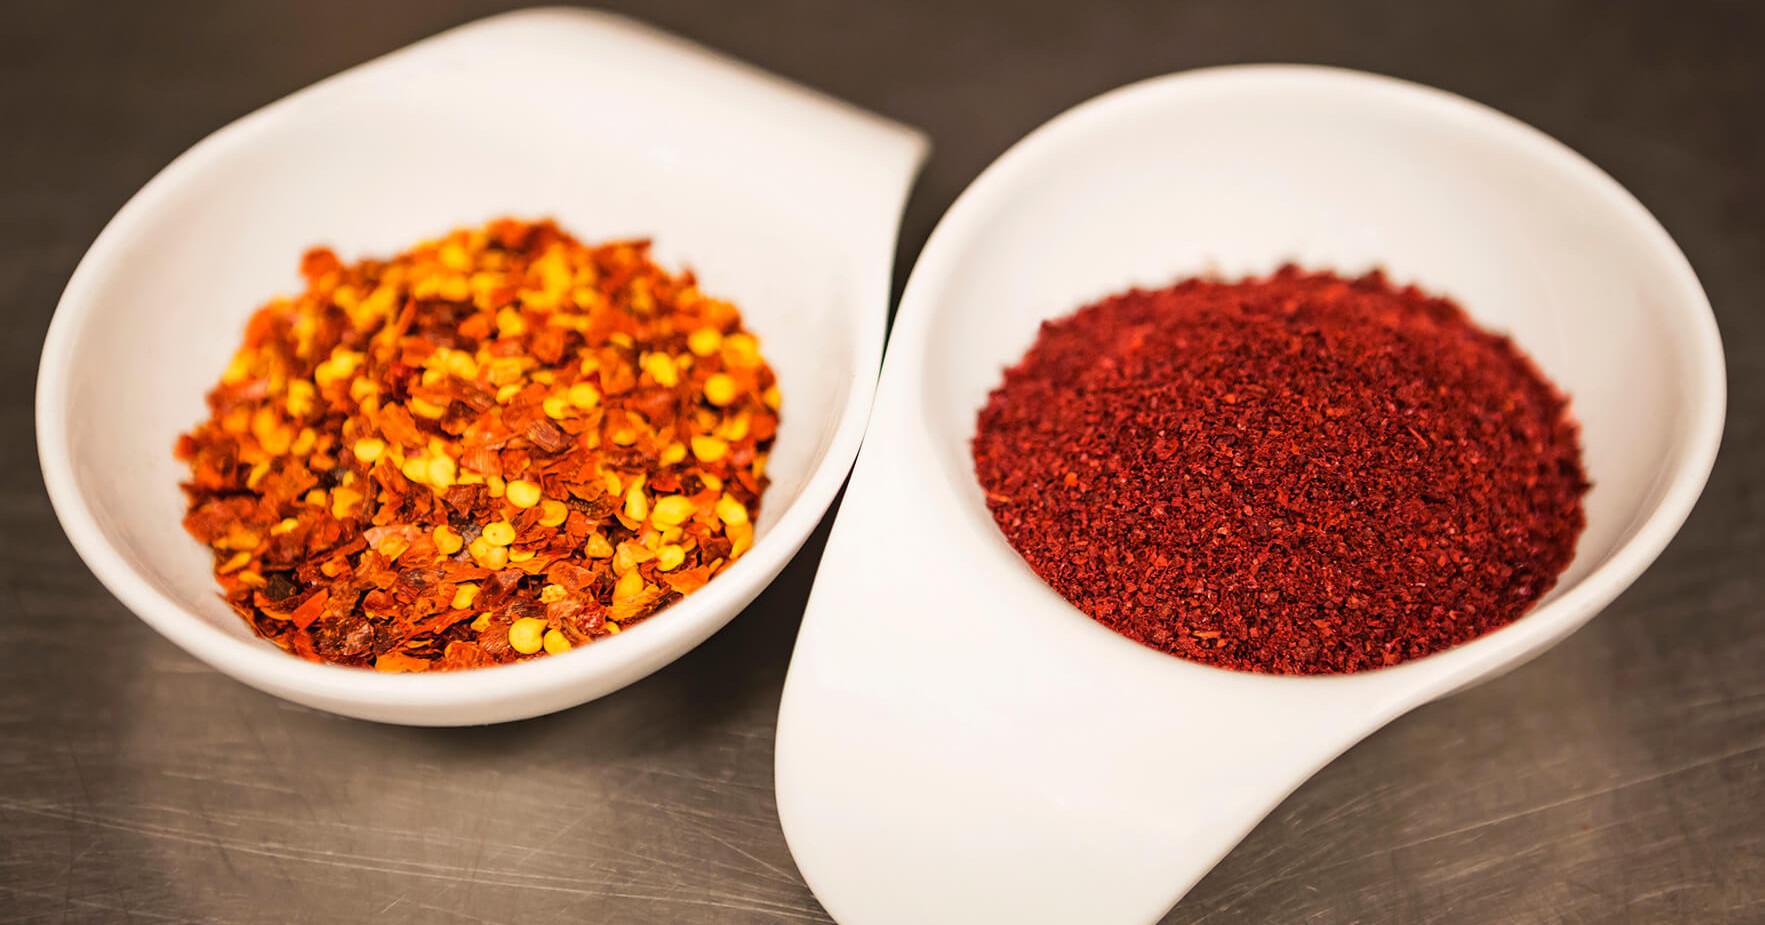 Cayenne Pepper Spice Seeds & Sumac.jpg